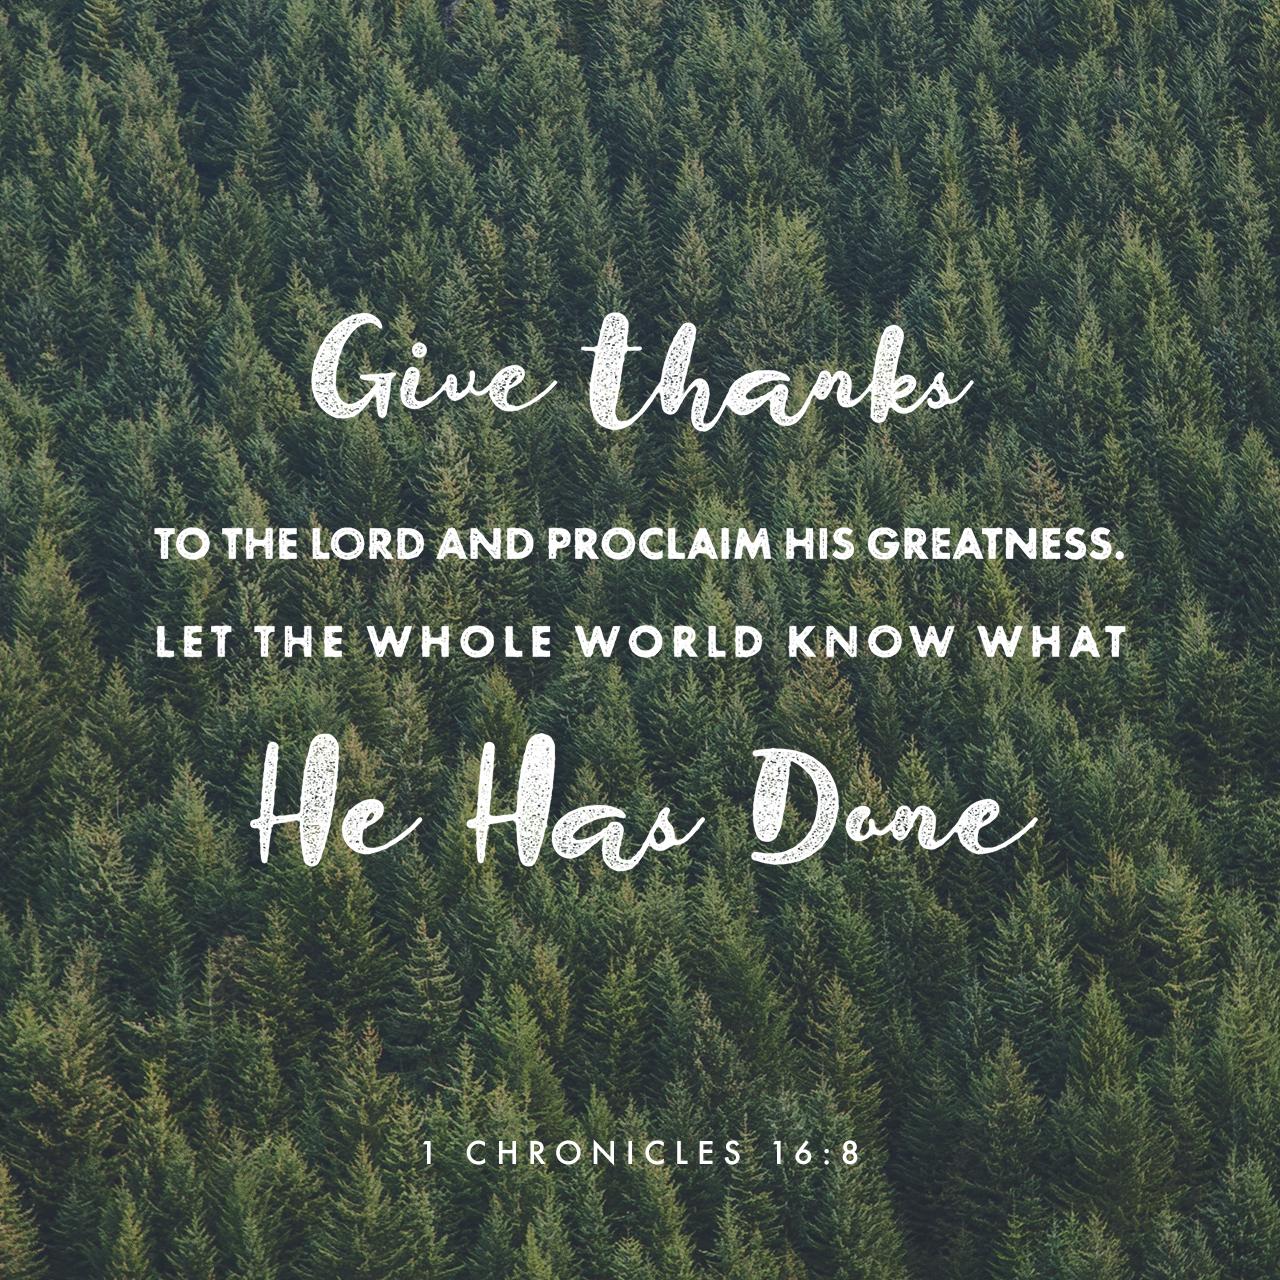 1 Chronicles 16:8 (JPG)